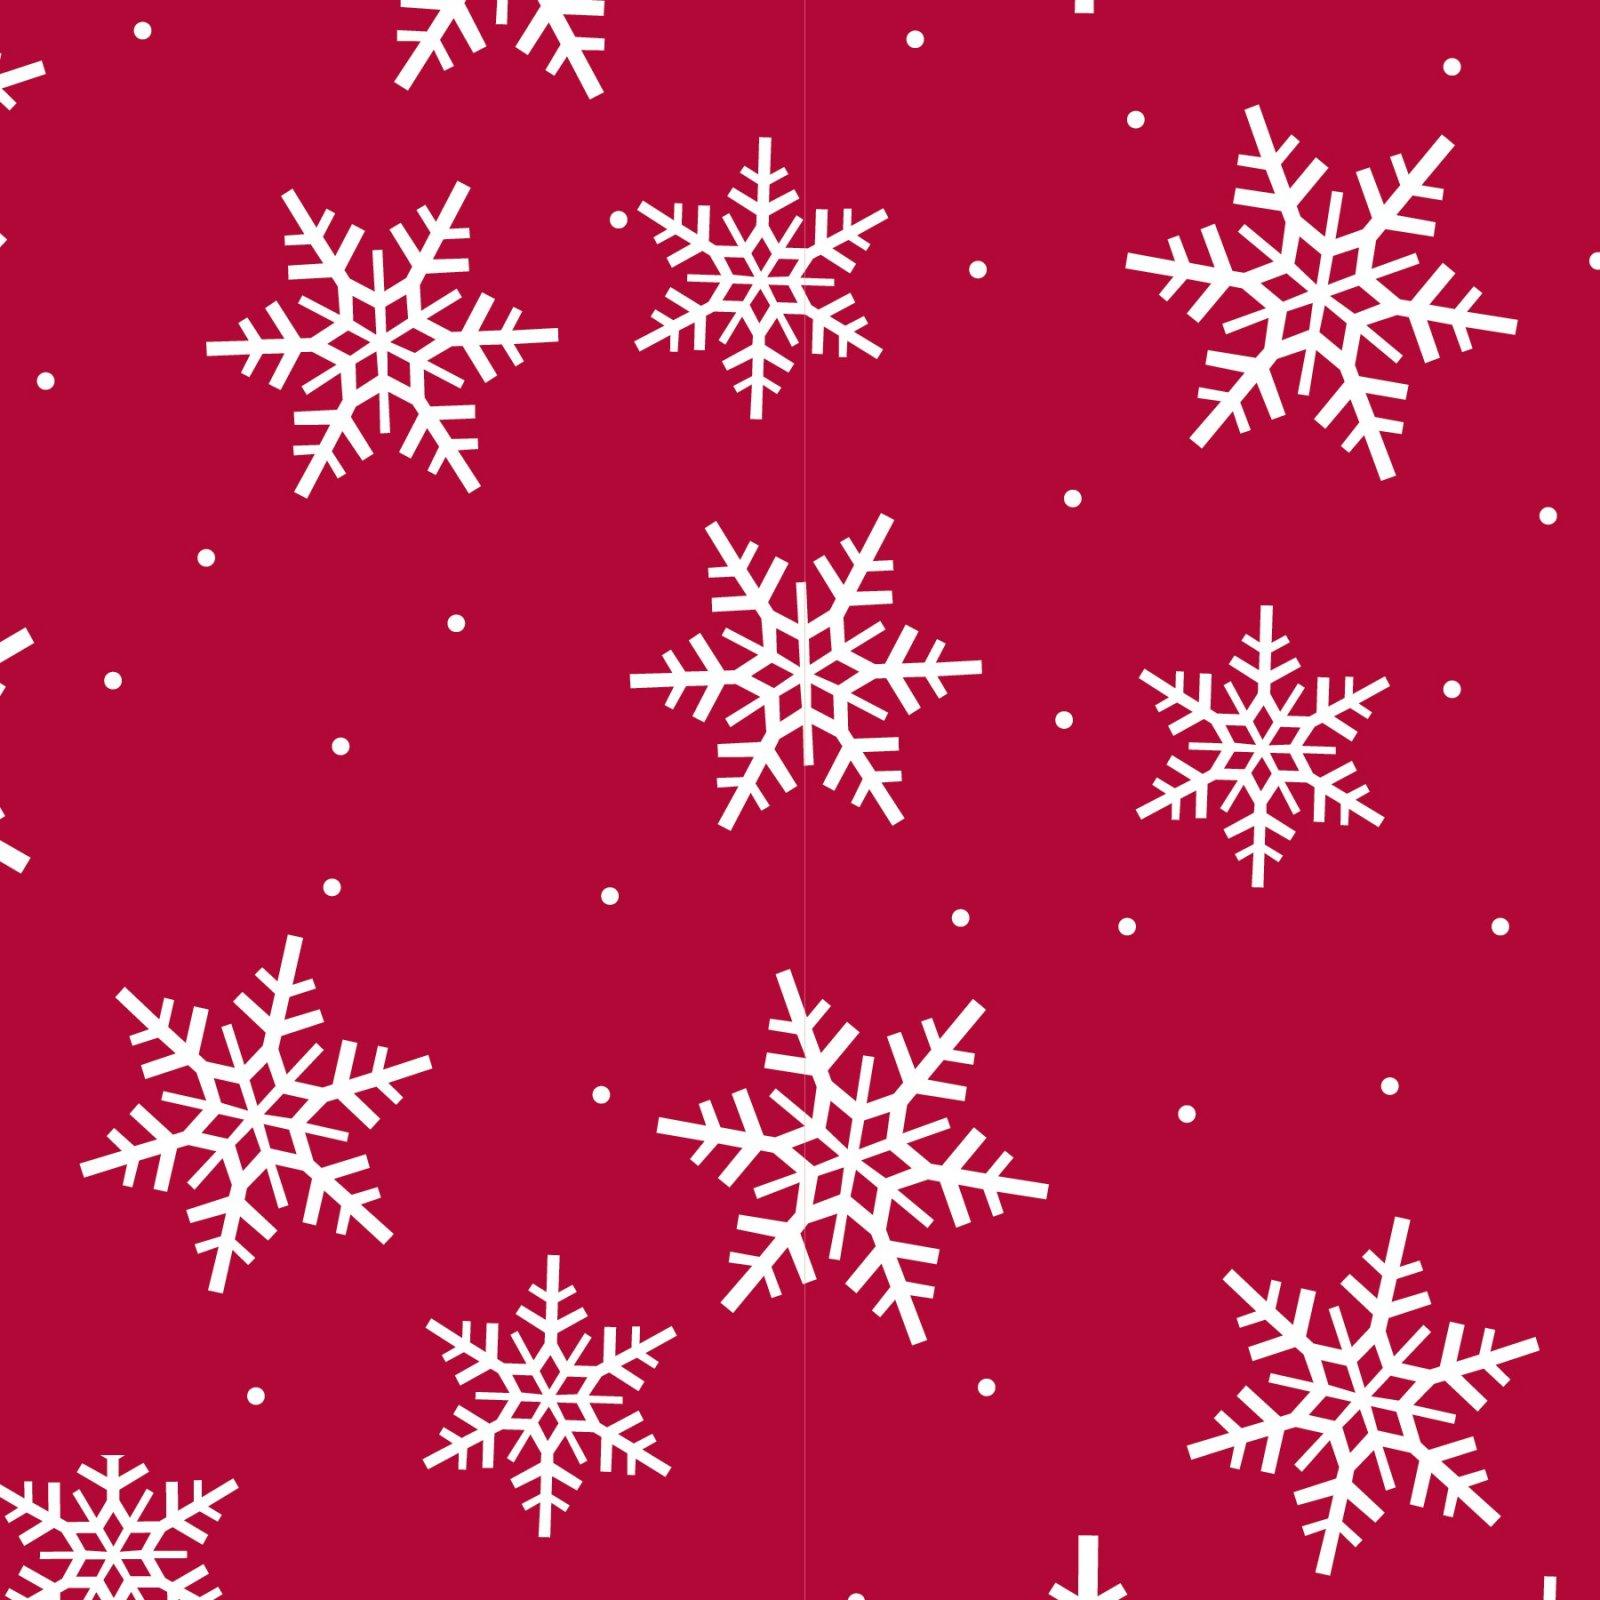 Snowflakes Red & White Fleece Fabric